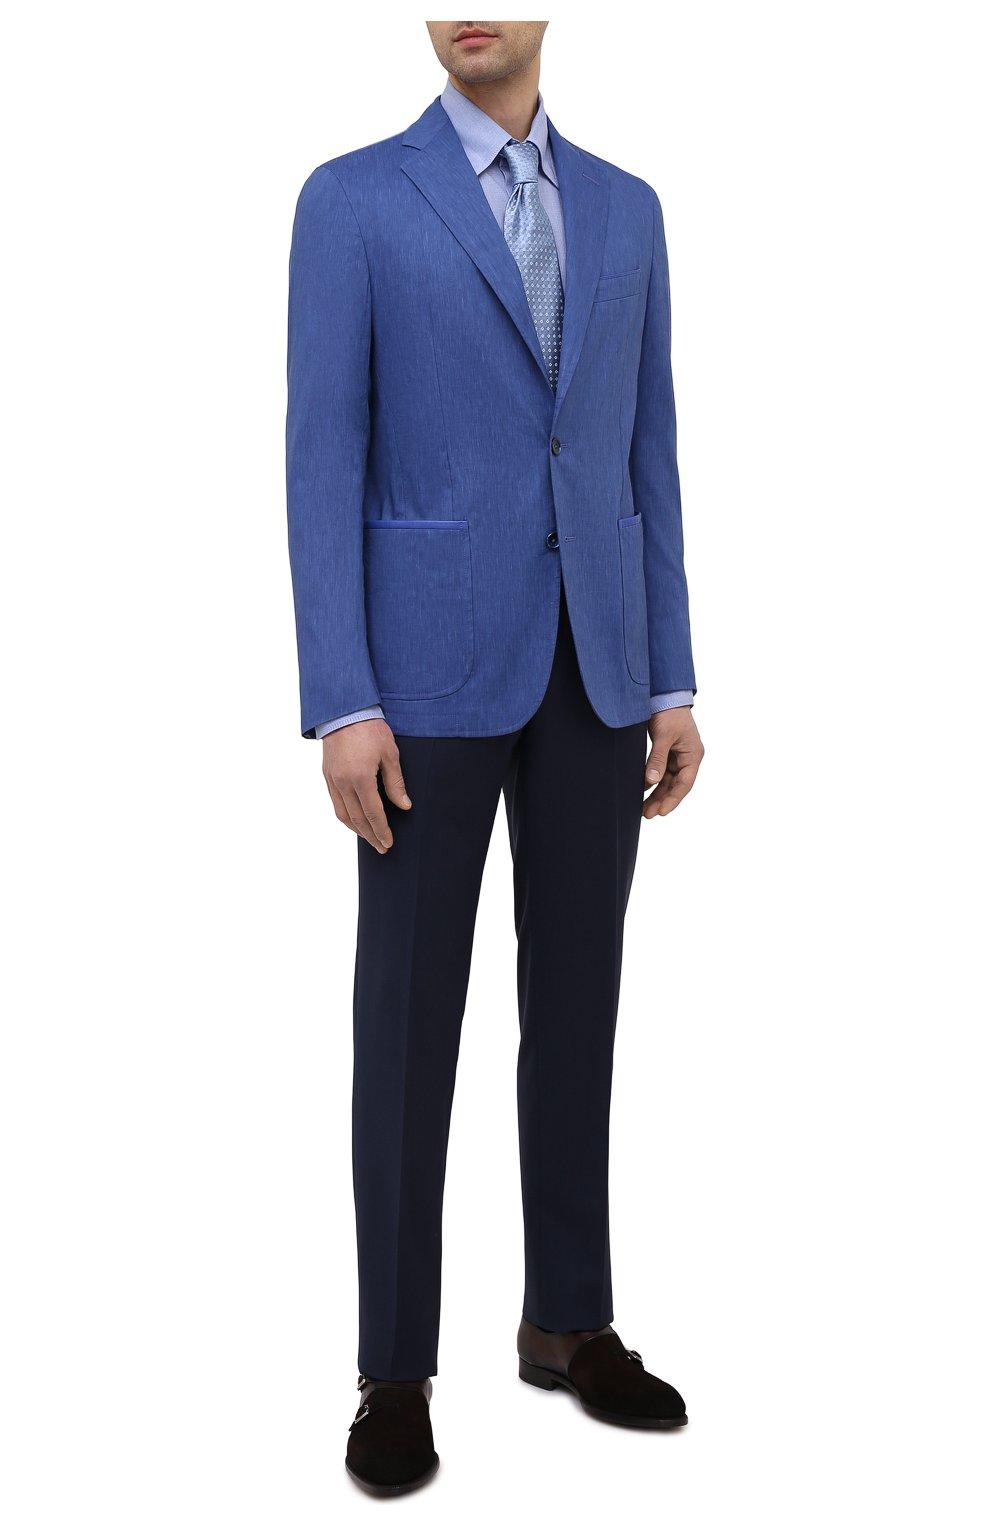 Мужской пиджак из шерсти и льна ZILLI темно-синего цвета, арт. MNV-ECKX-2-E6031/0001 | Фото 2